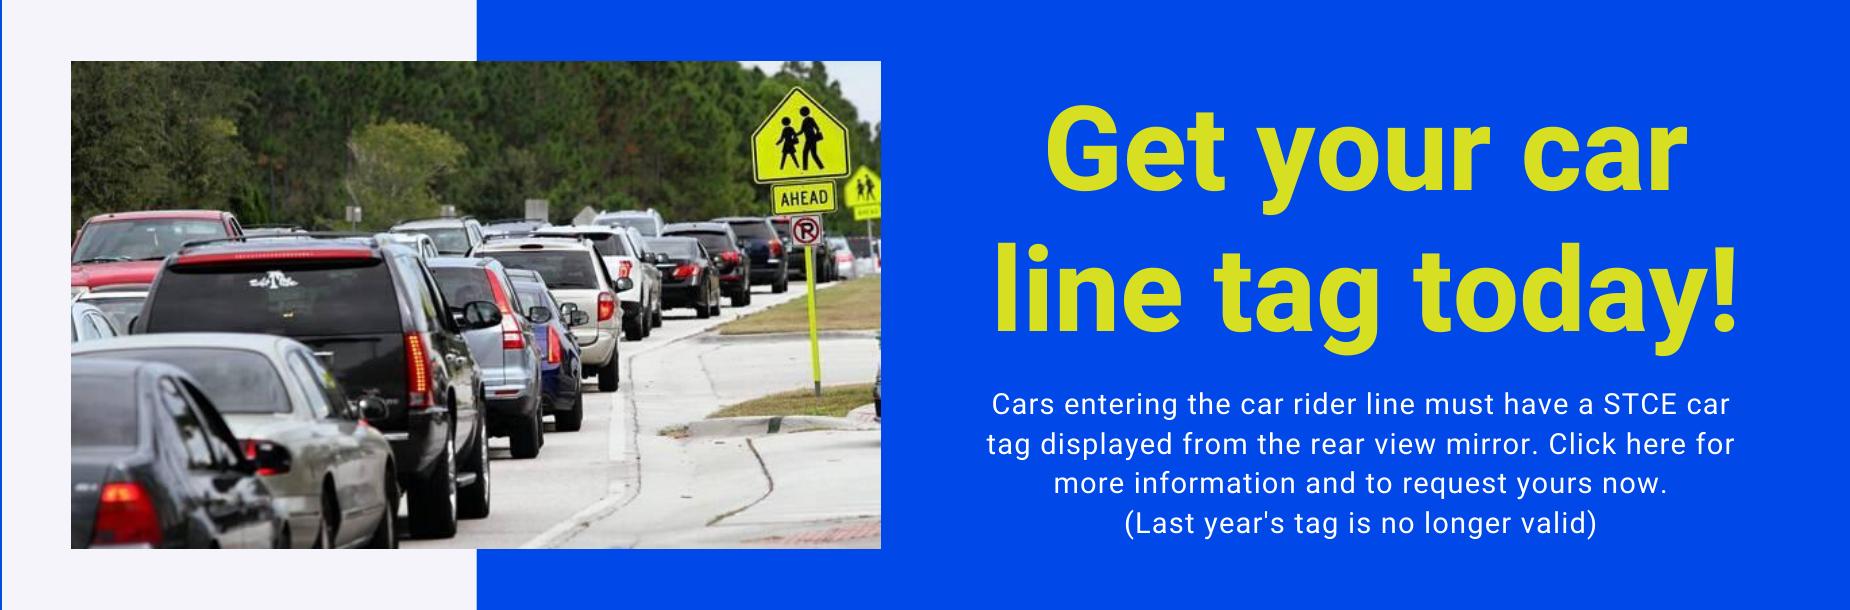 order car line tag